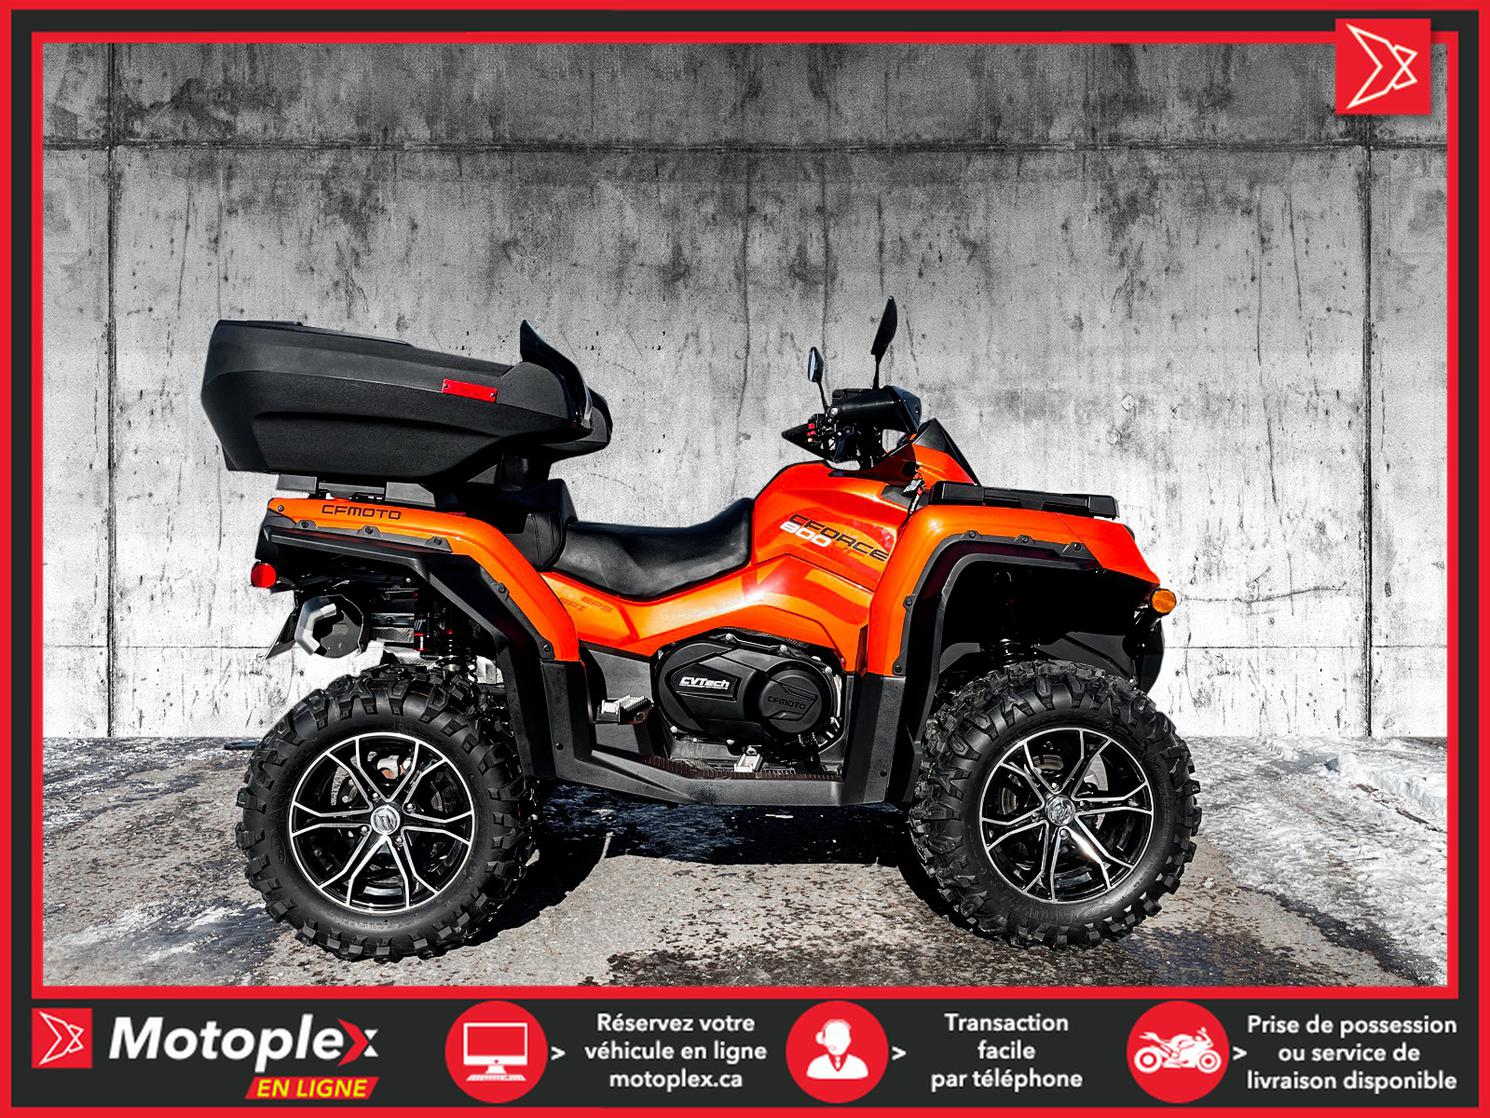 2021 CFMOTO 800 XC CLASSIC  (Options incluses) - 34$/SEMAINE